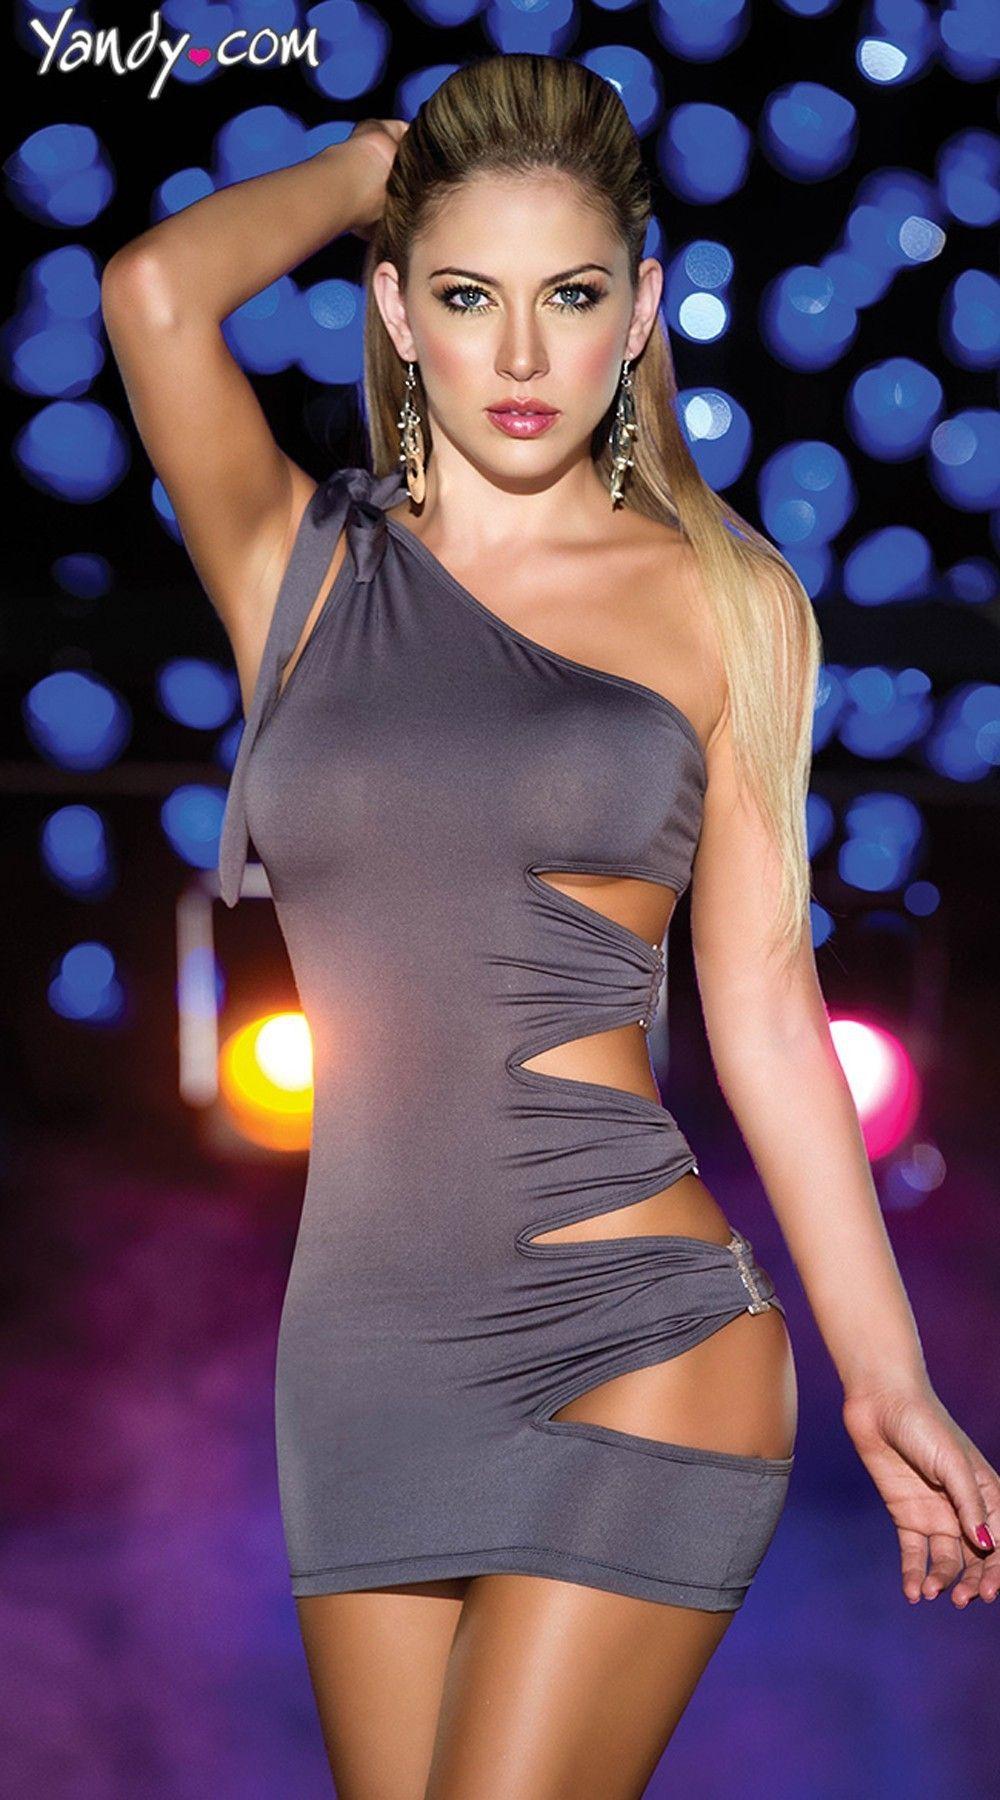 Dresses yandy photo